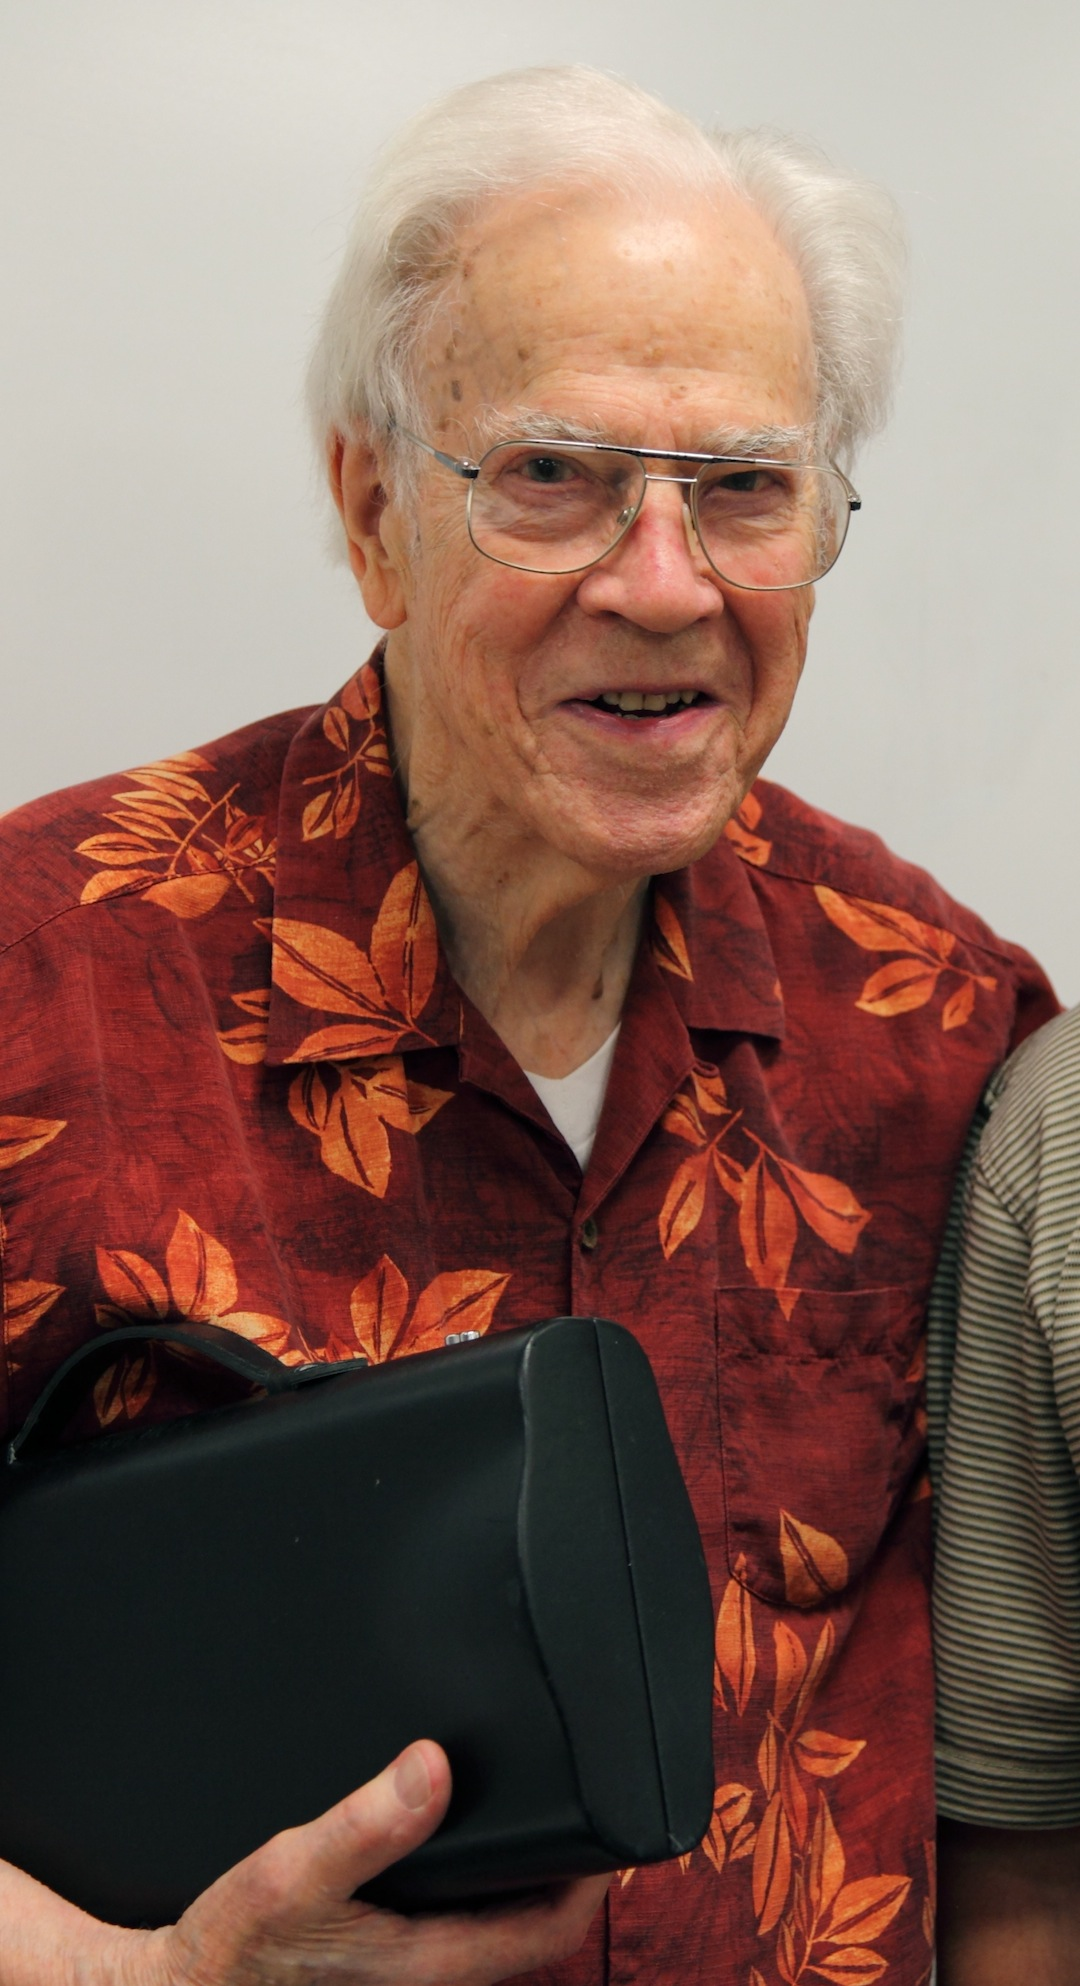 University Of Maine >> Norman Leyden - Wikipedia